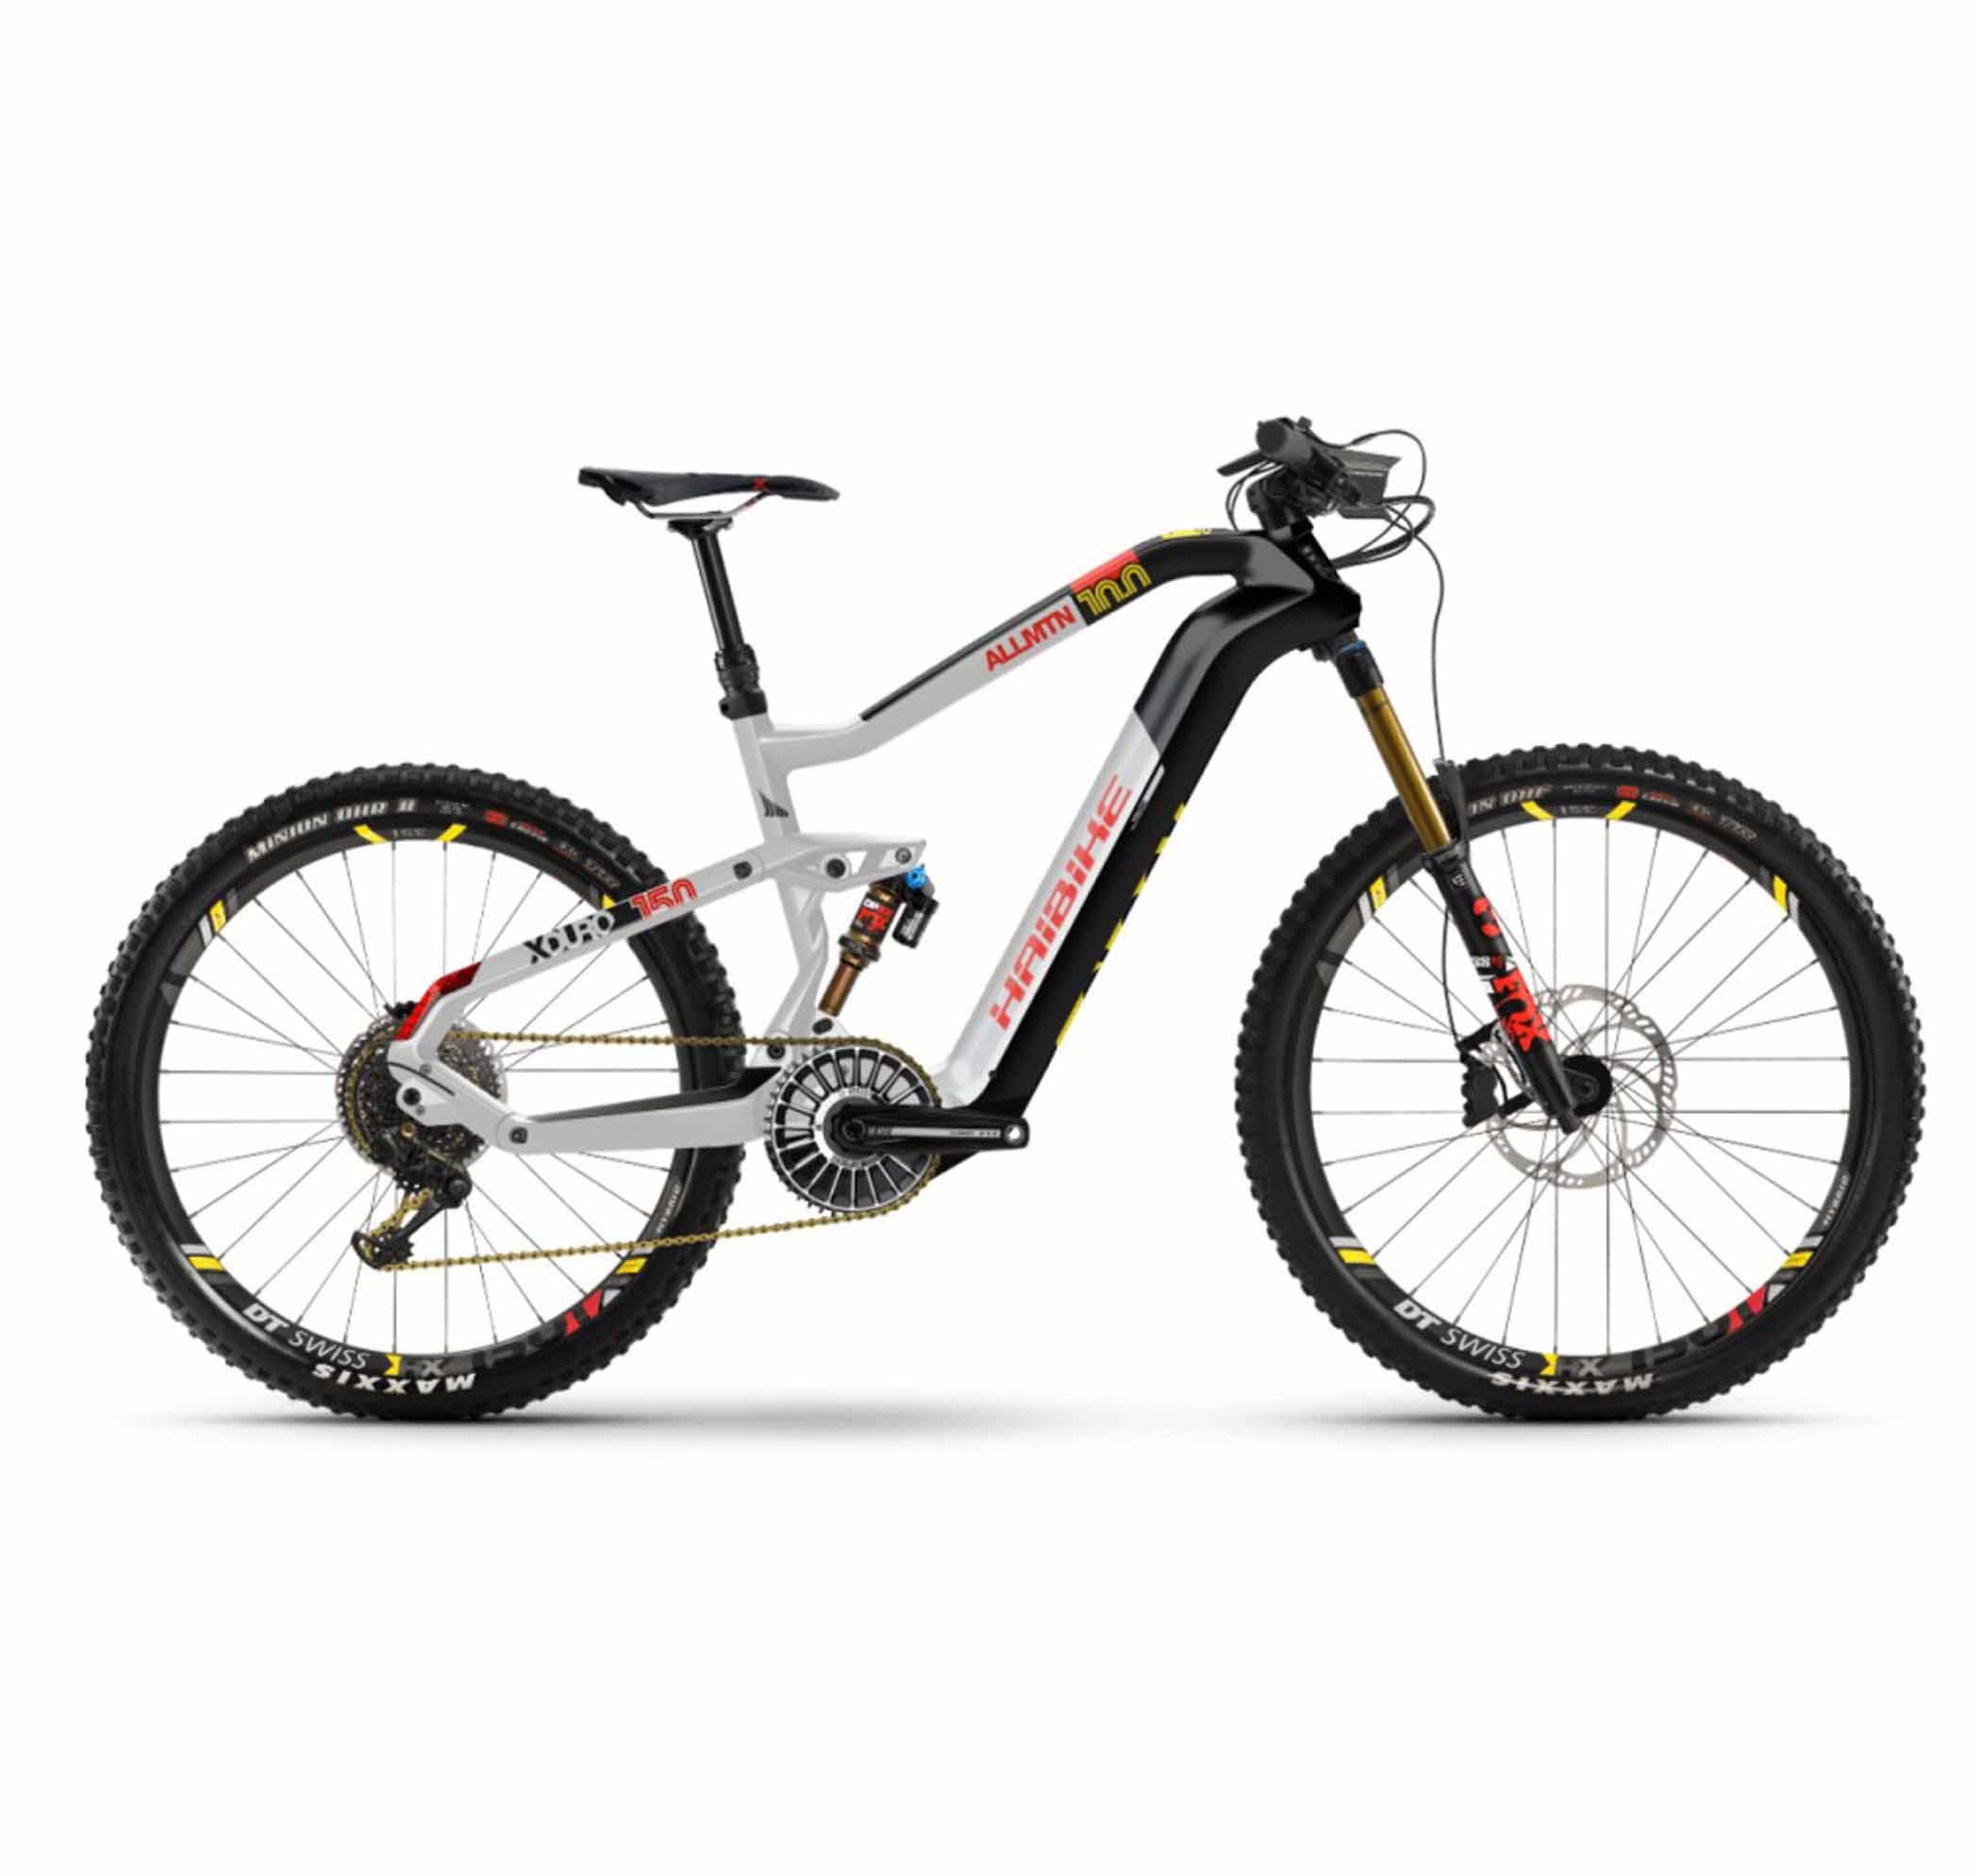 Haibike_Rodeo_Bike_Flyon_XDRUO_Allmtn_10.0